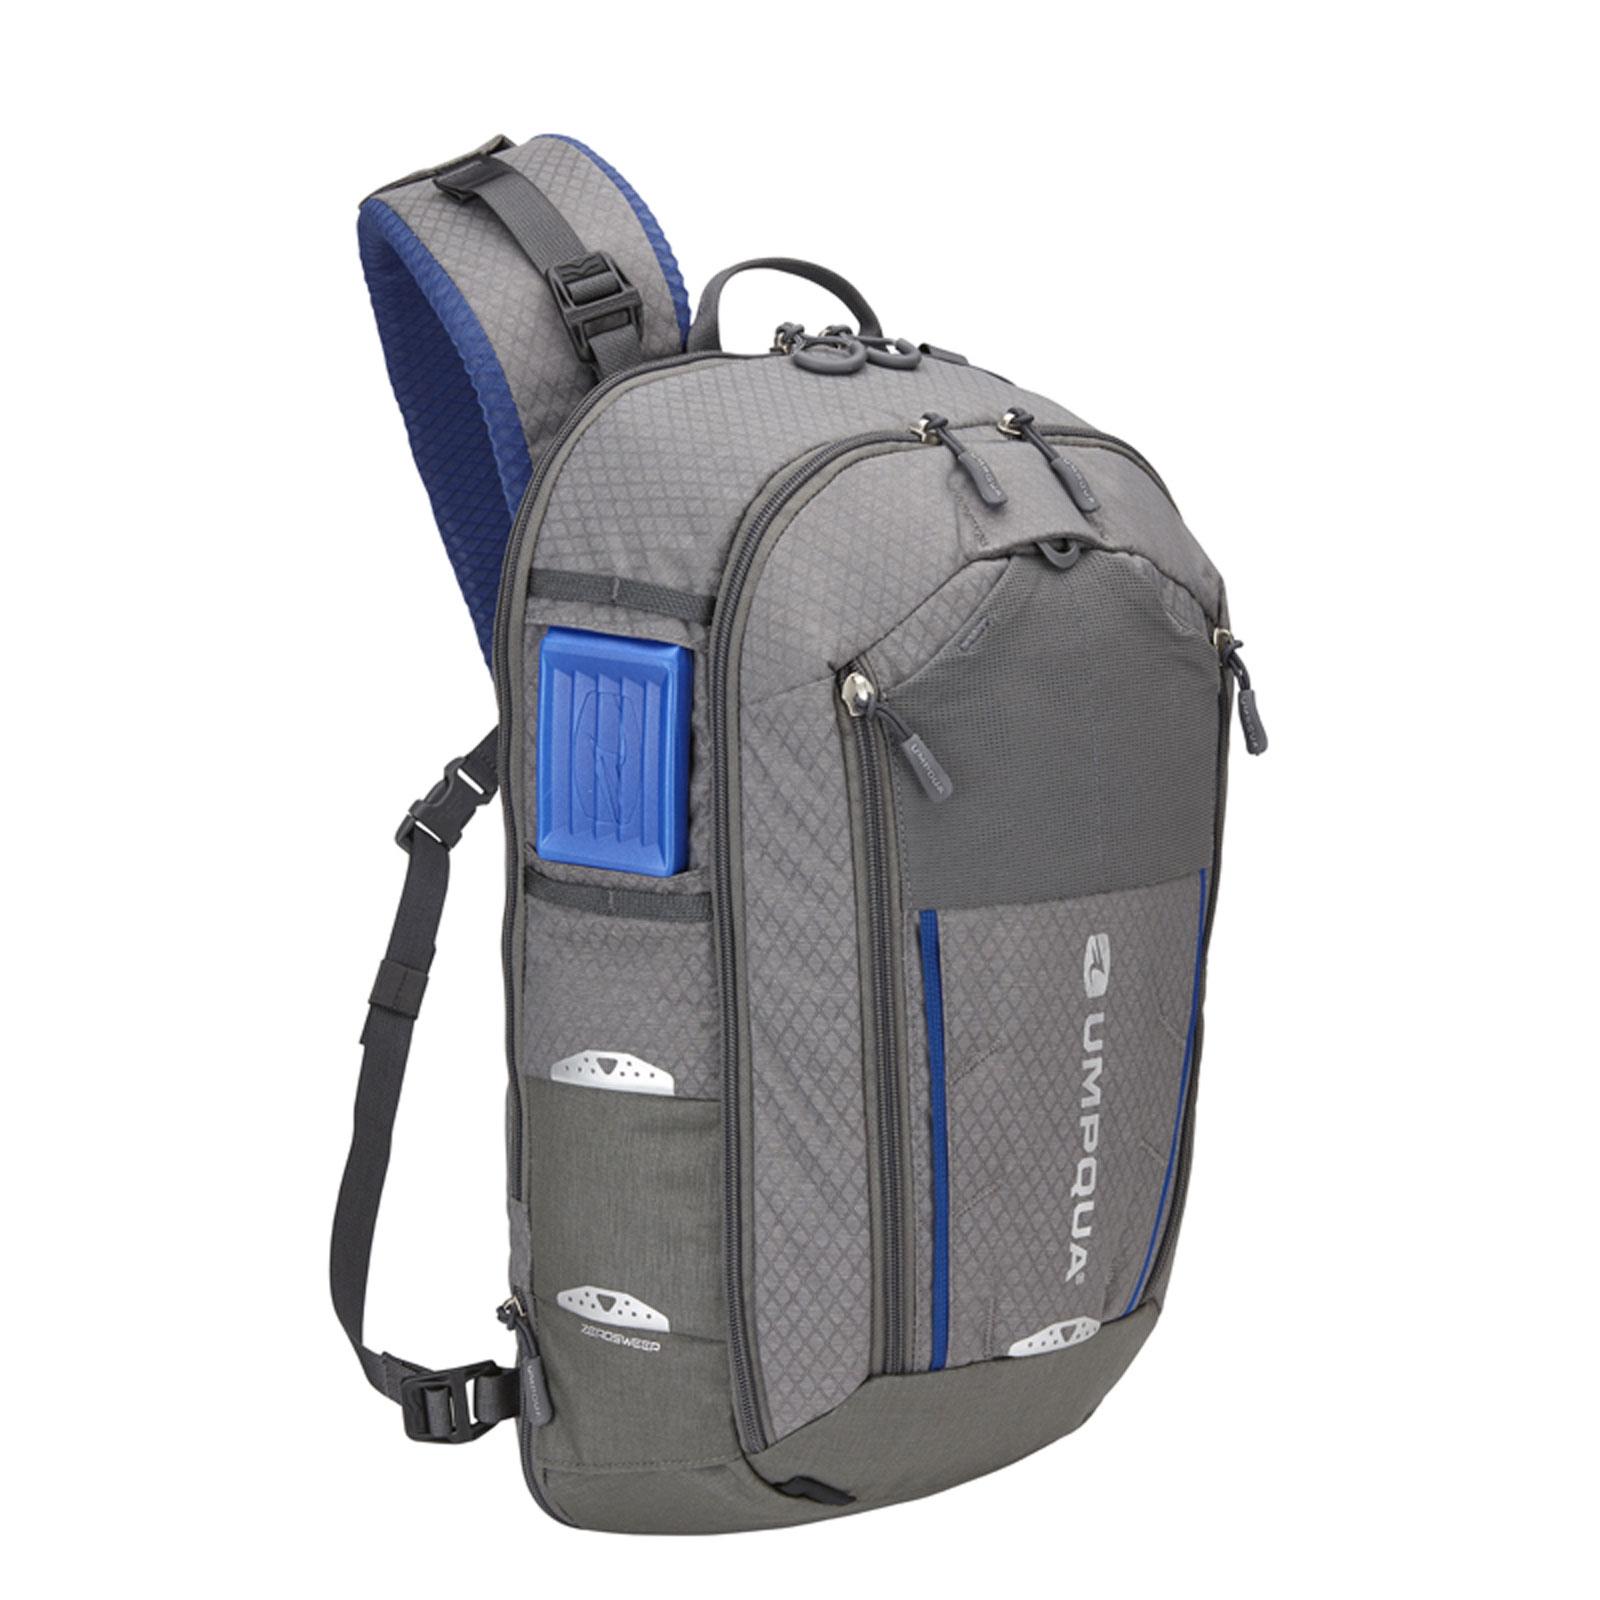 Umpqua ambi sling zs zero sweep fly fishing tackle gear for Fishing backpack tackle bag